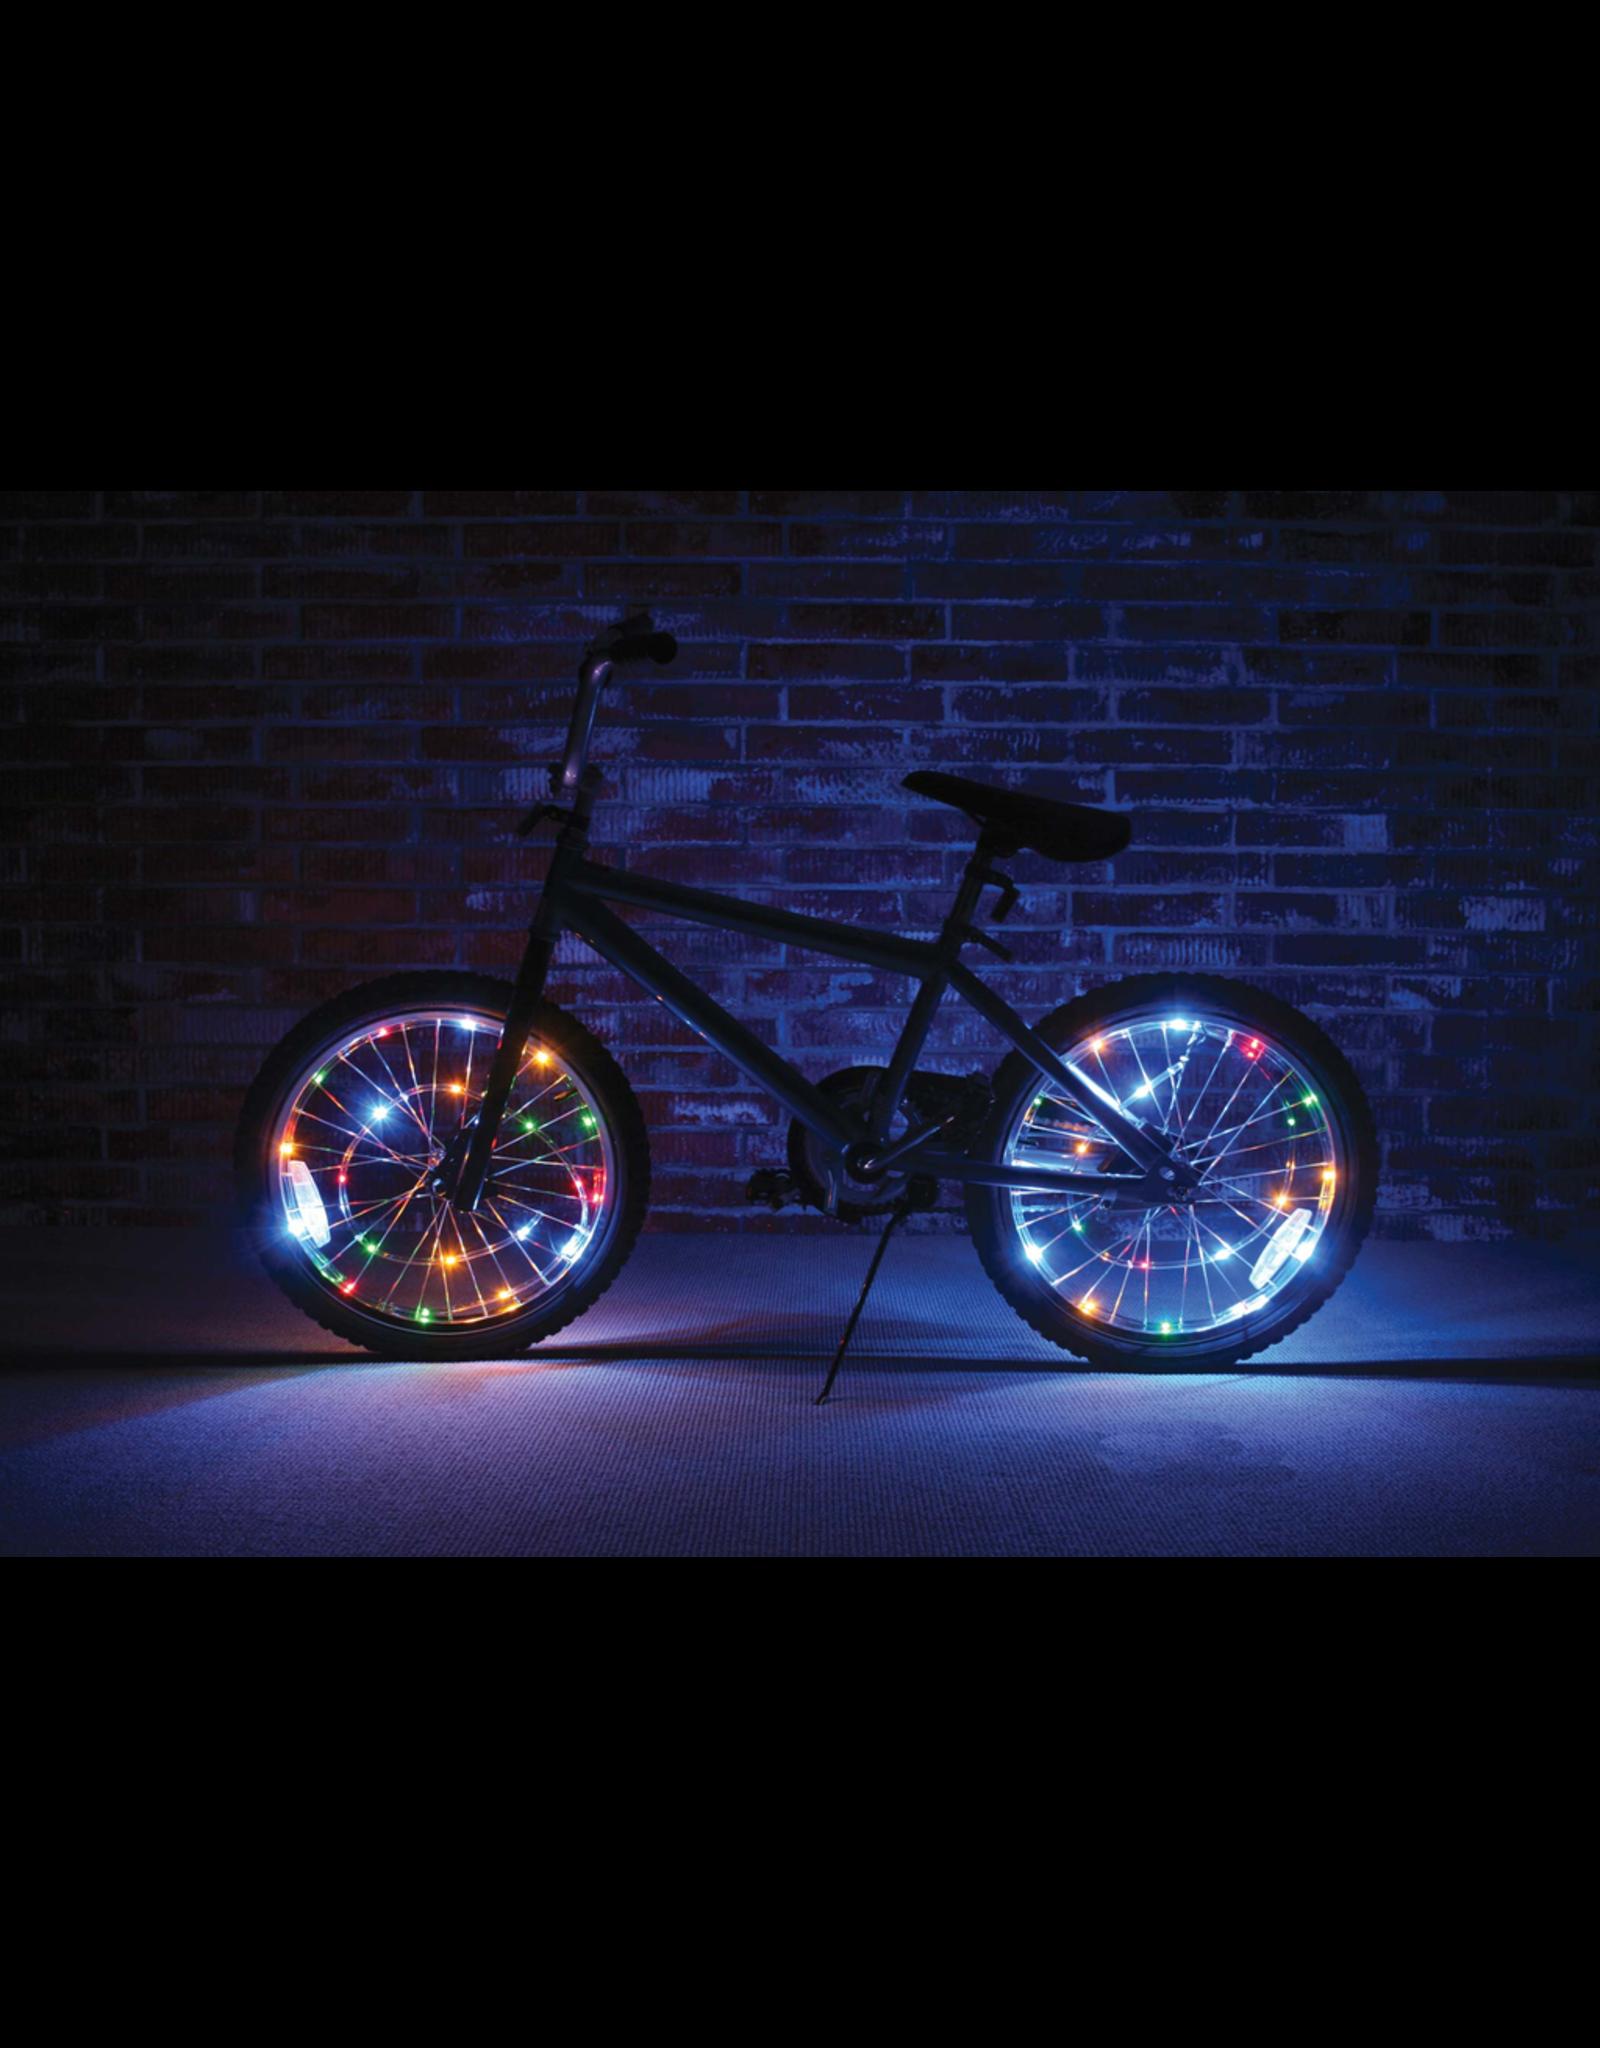 Brightz, Ltd. Wheel Brightz LED Lights - Multicolor (ONE WHEEL)